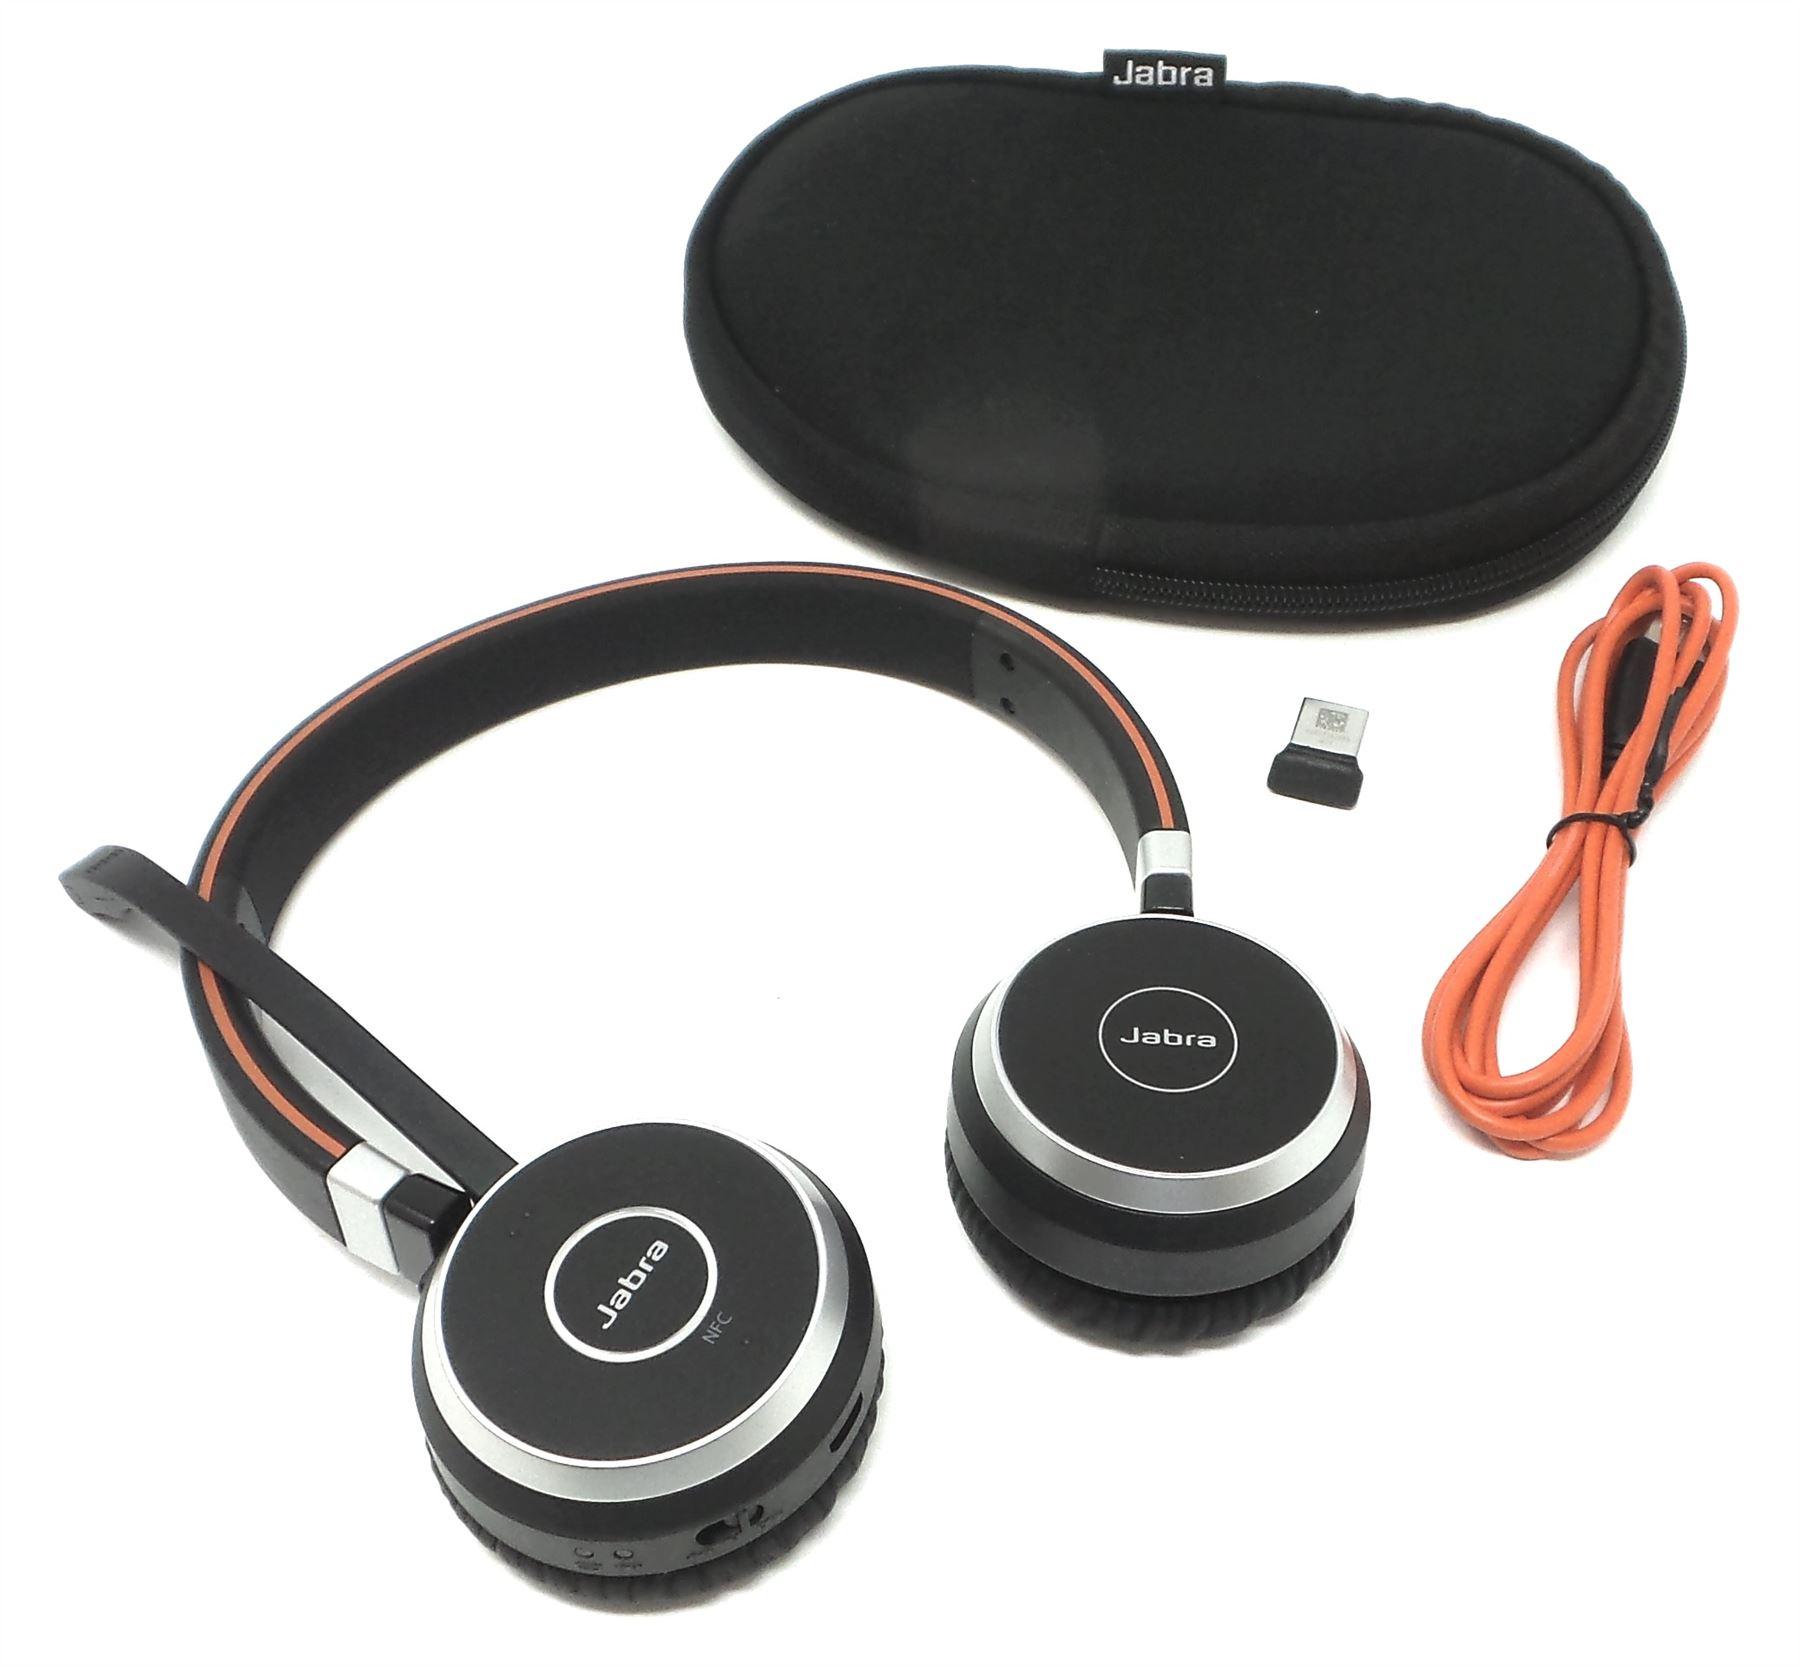 Jabra Evolve-65 Wireless-Stereo-Bluetooth Headset